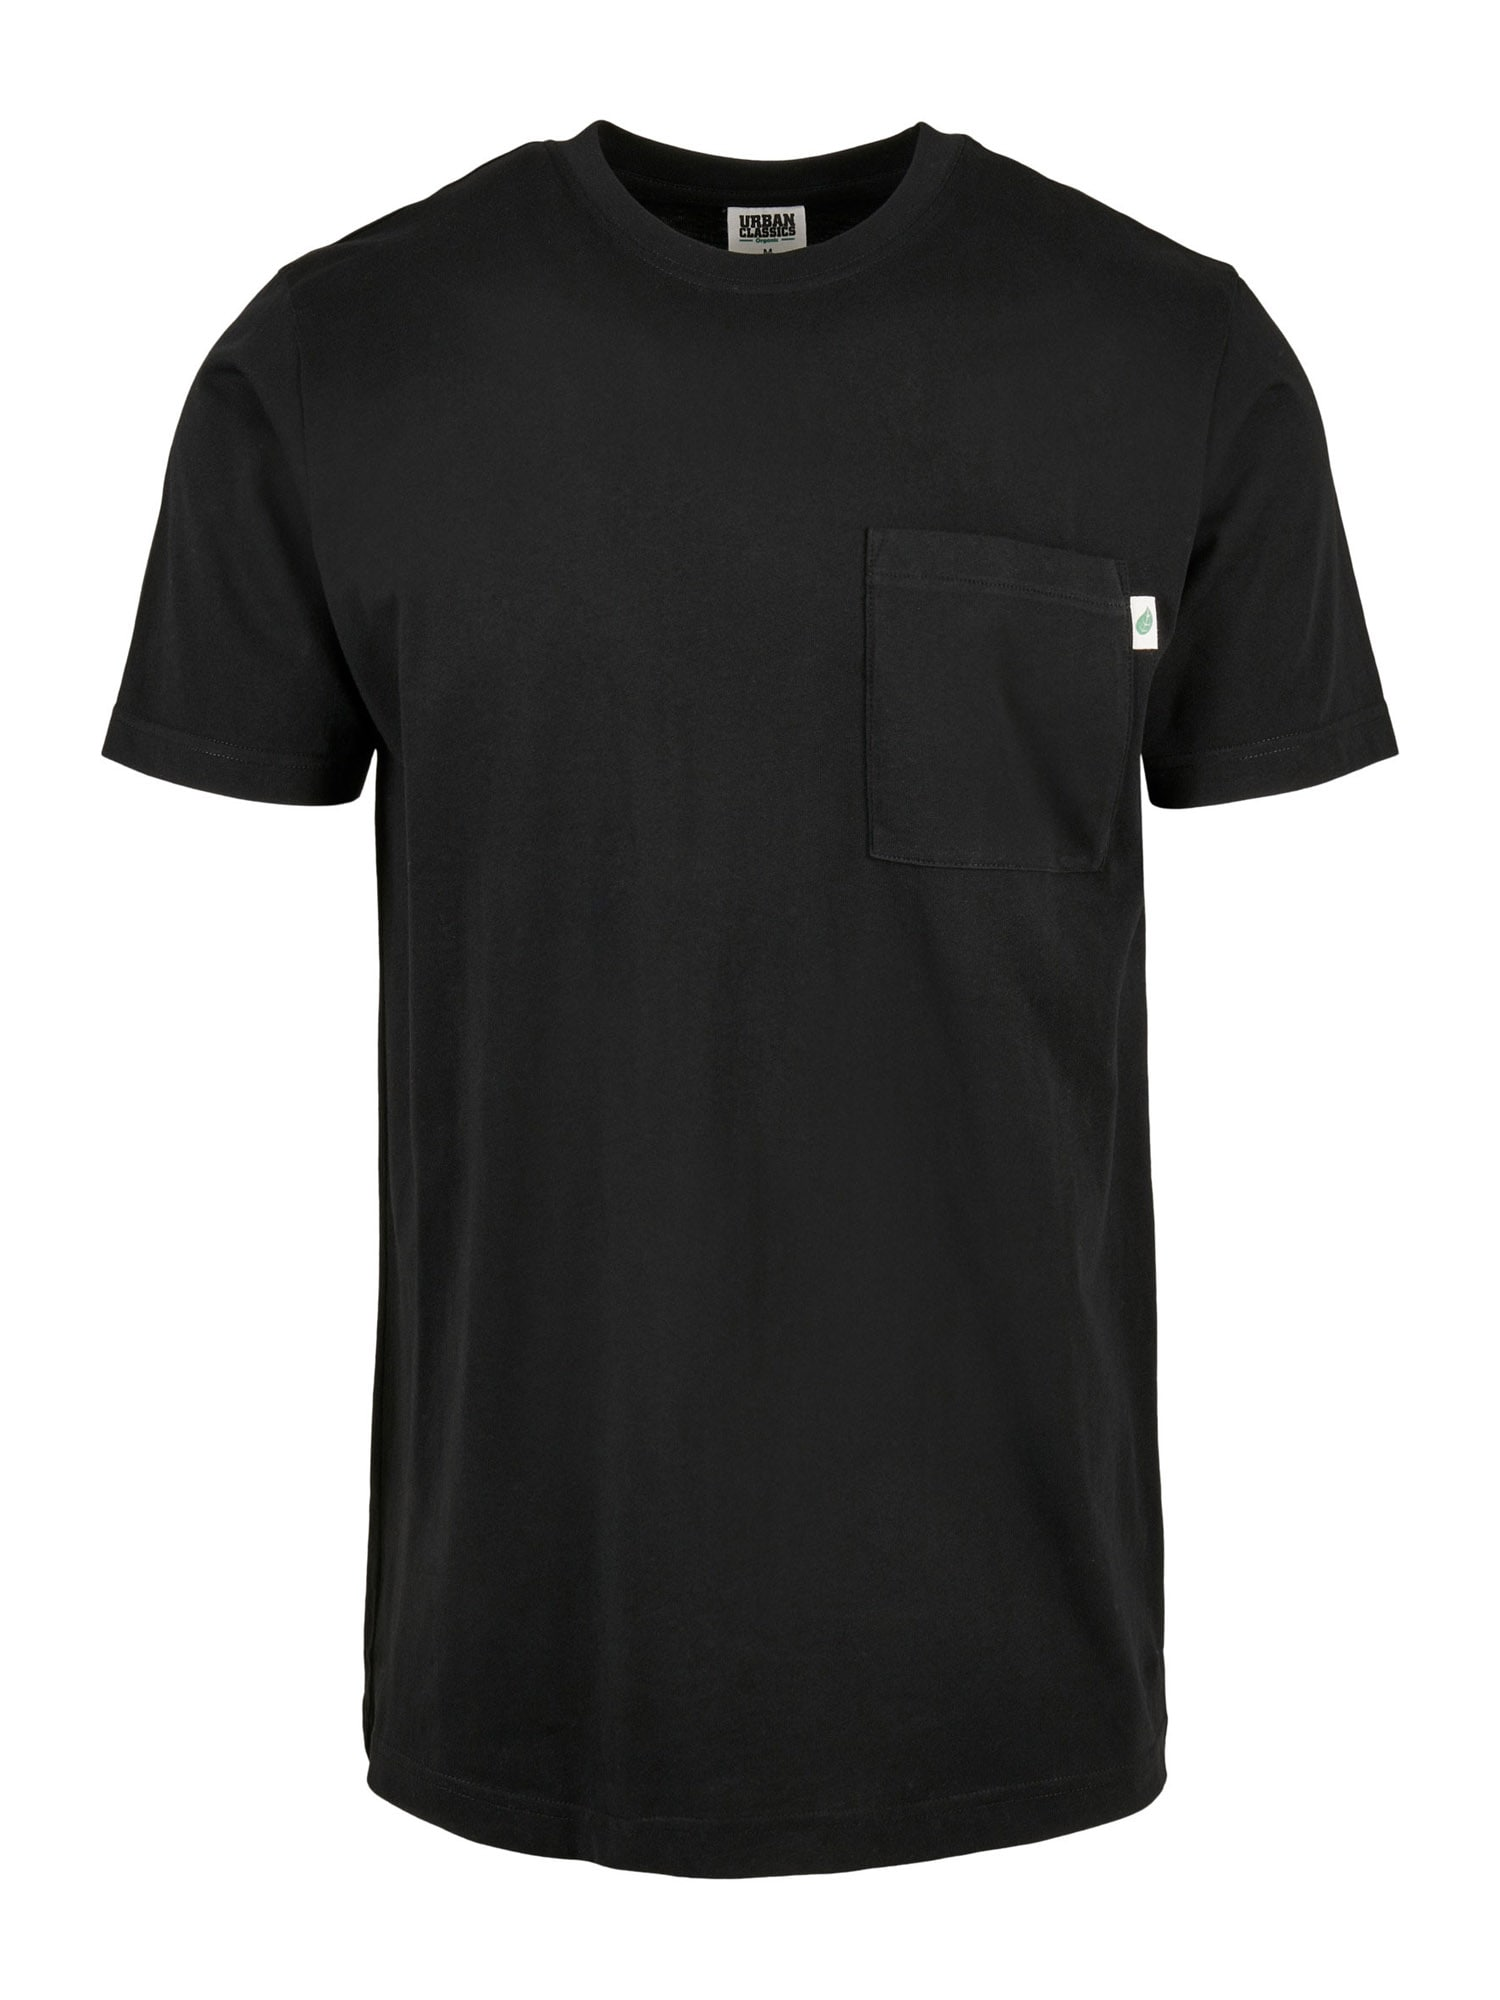 Urban Classics Big & Tall Marškinėliai juoda